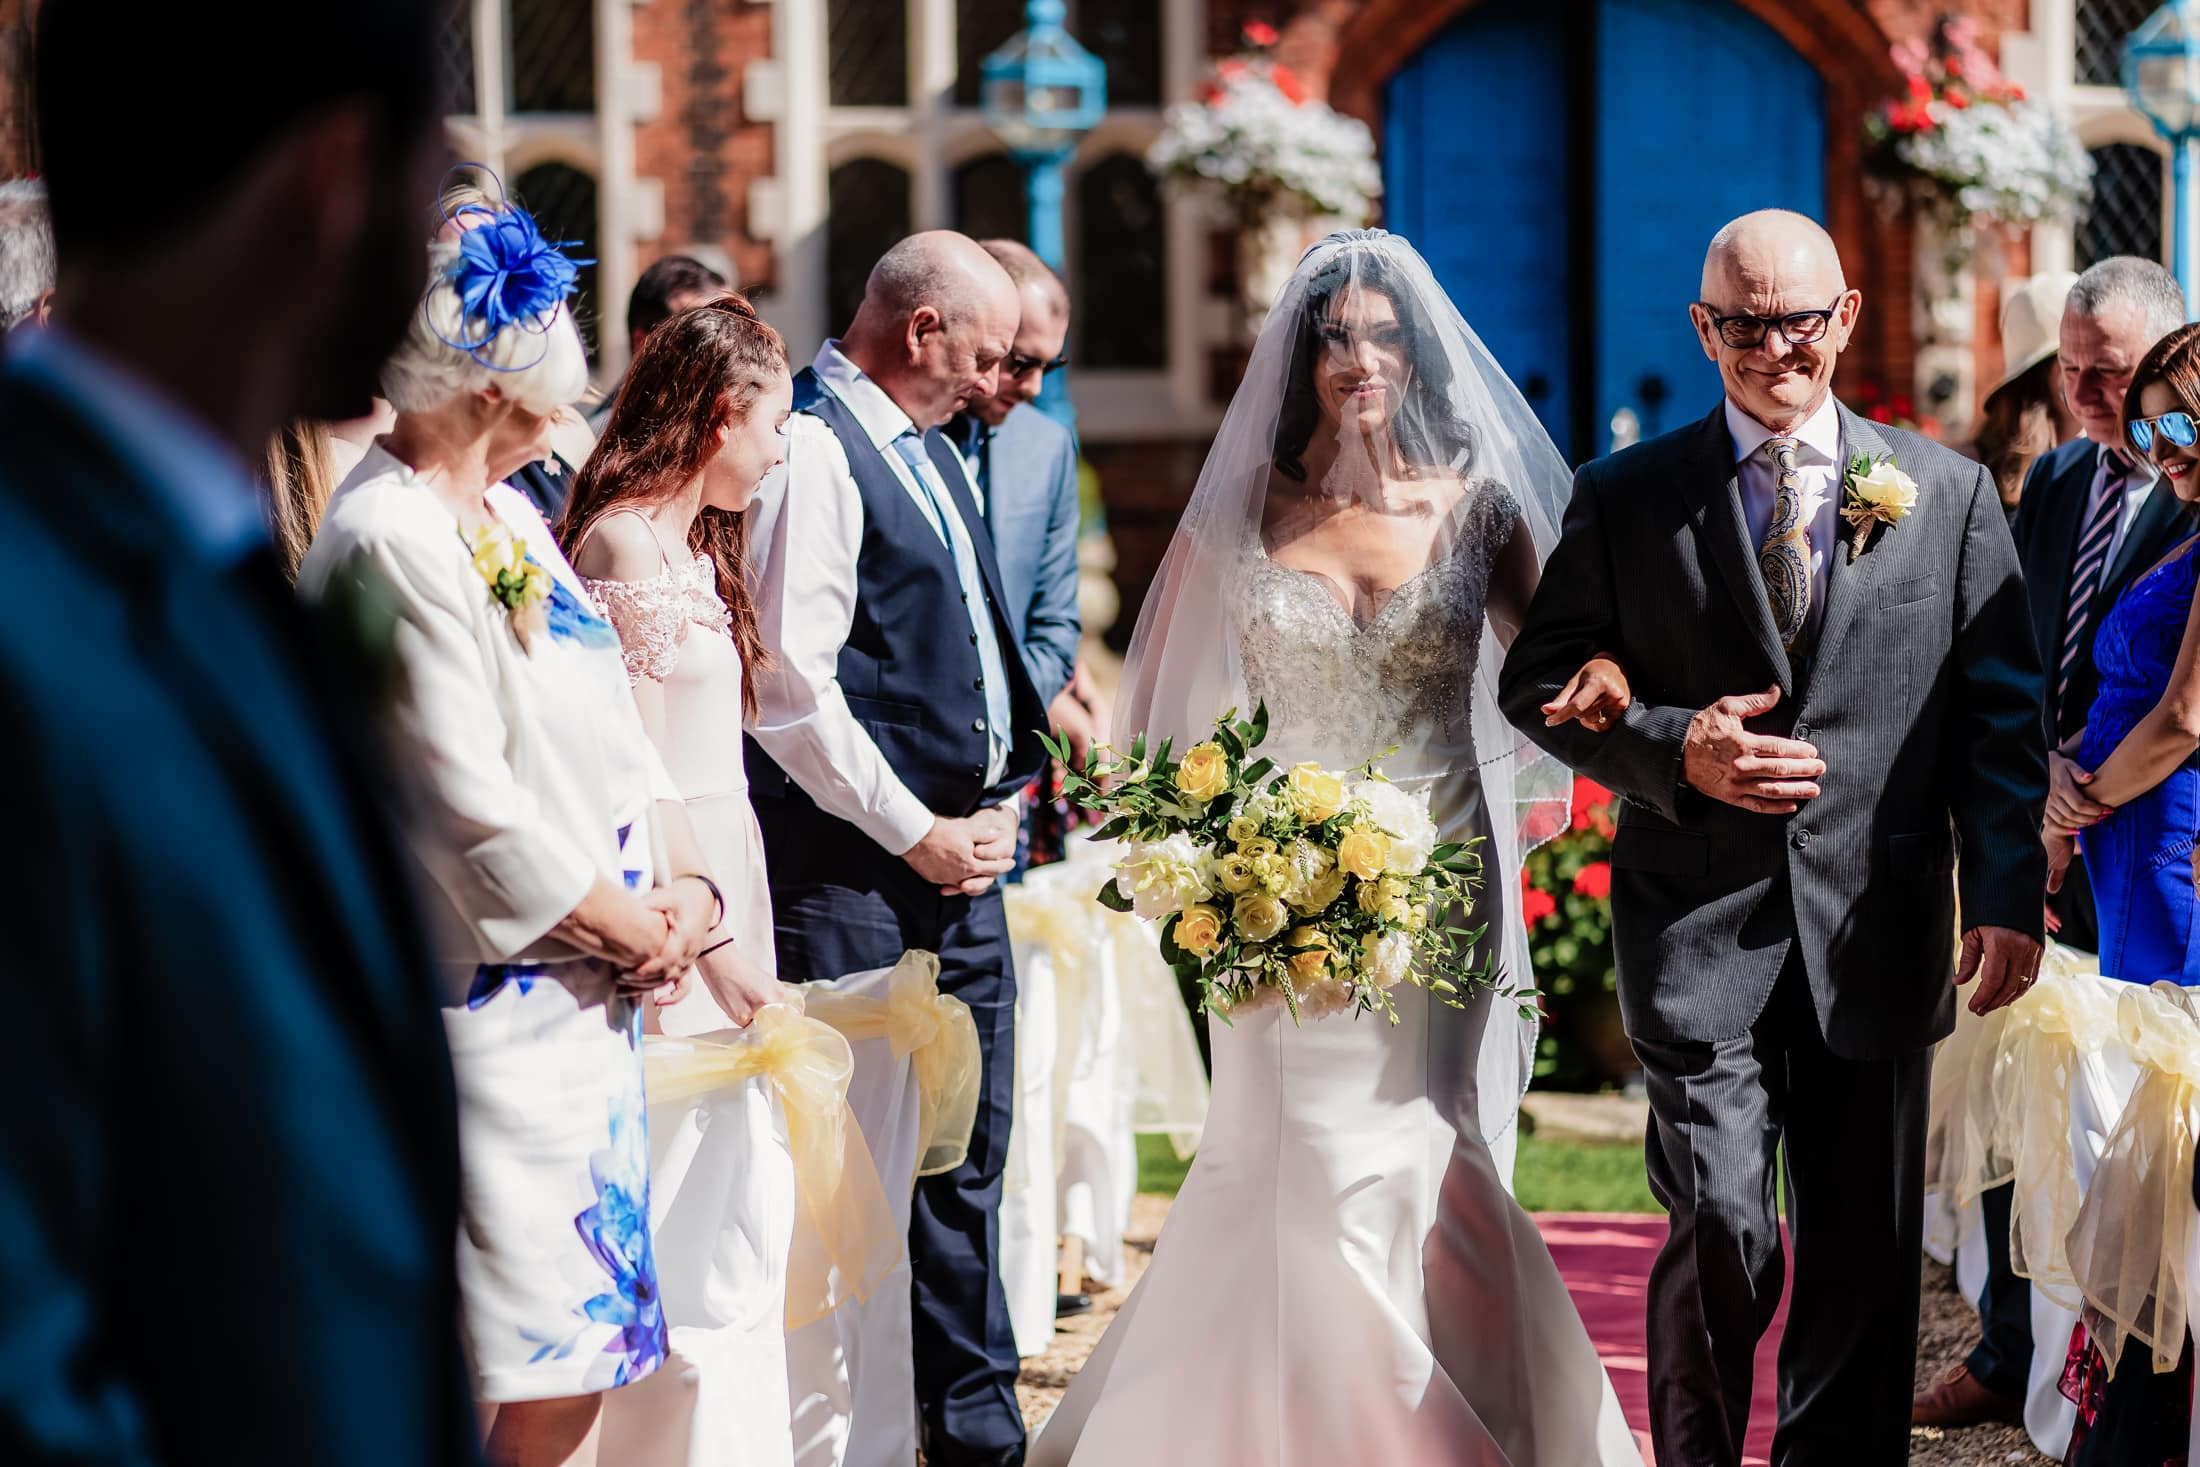 A courtyard wedding ceremony at gosfield hall